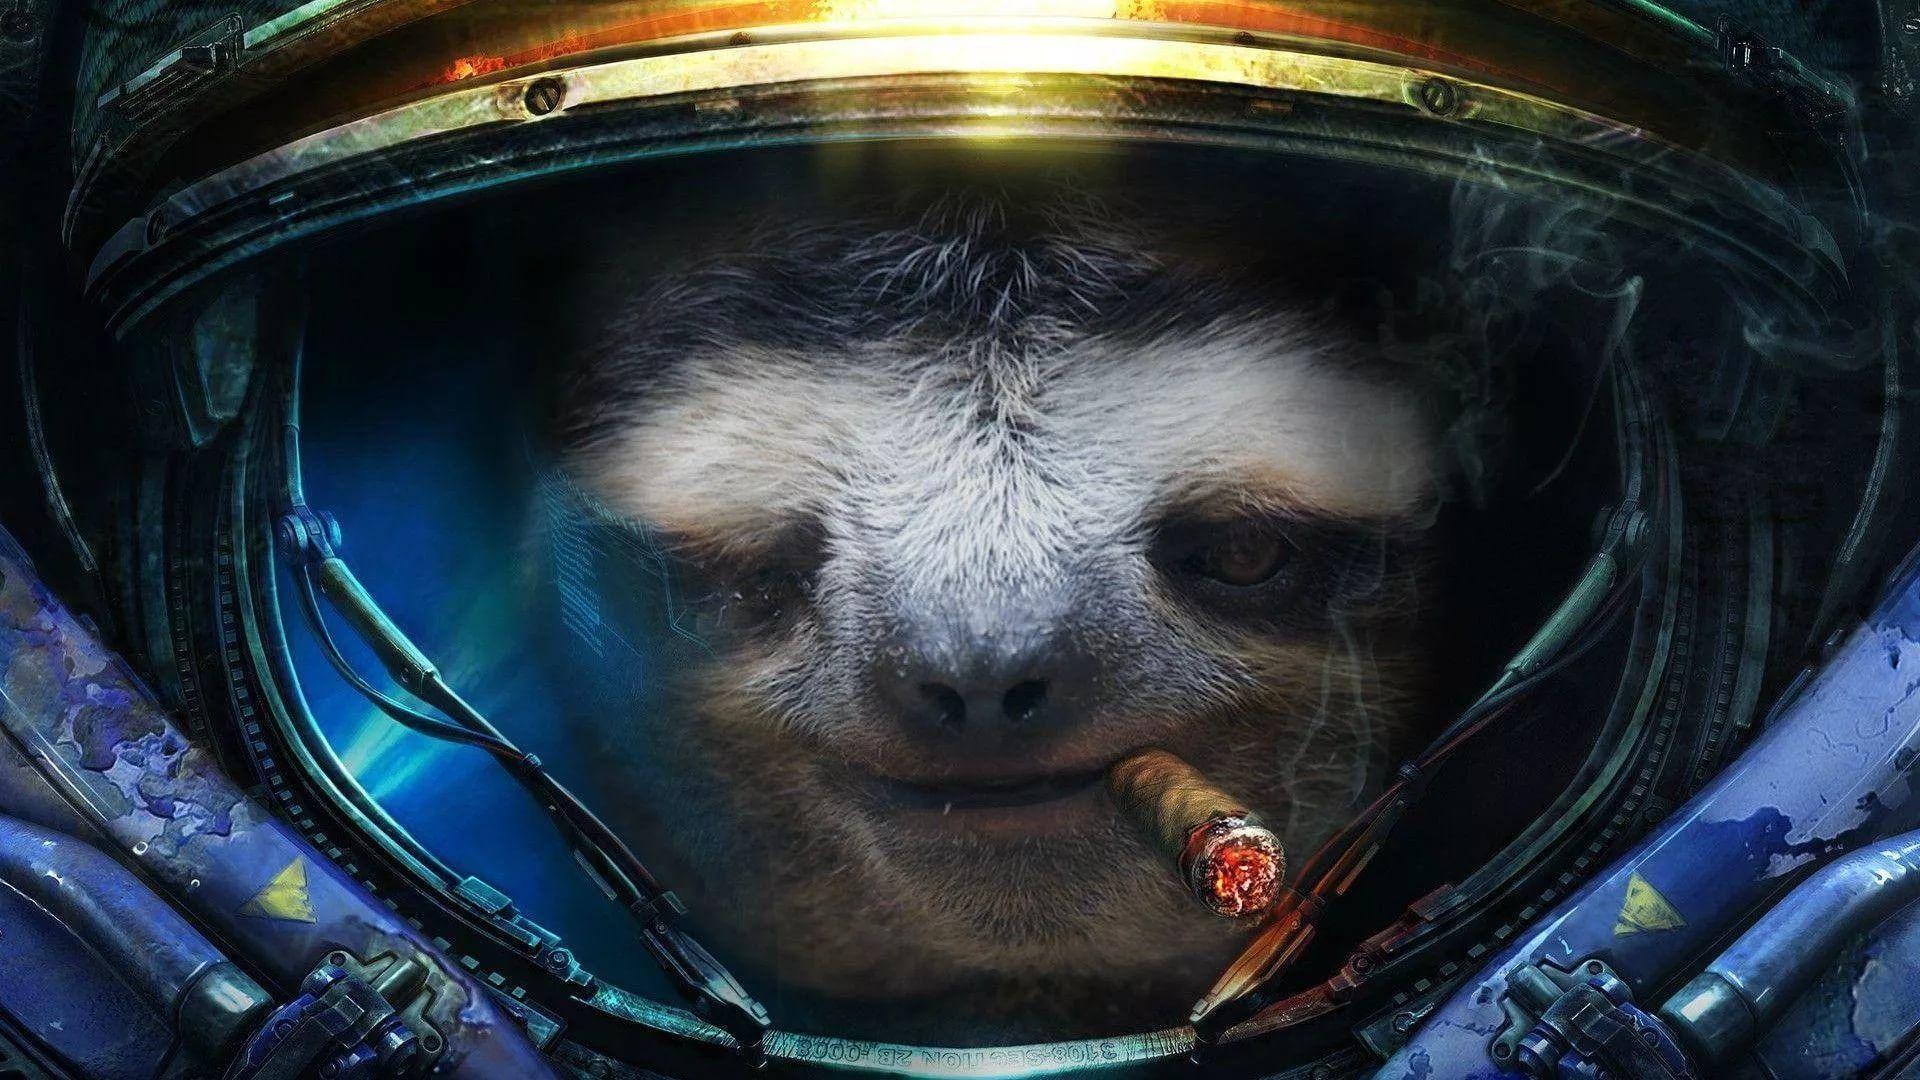 Sloth HD Wallpaper